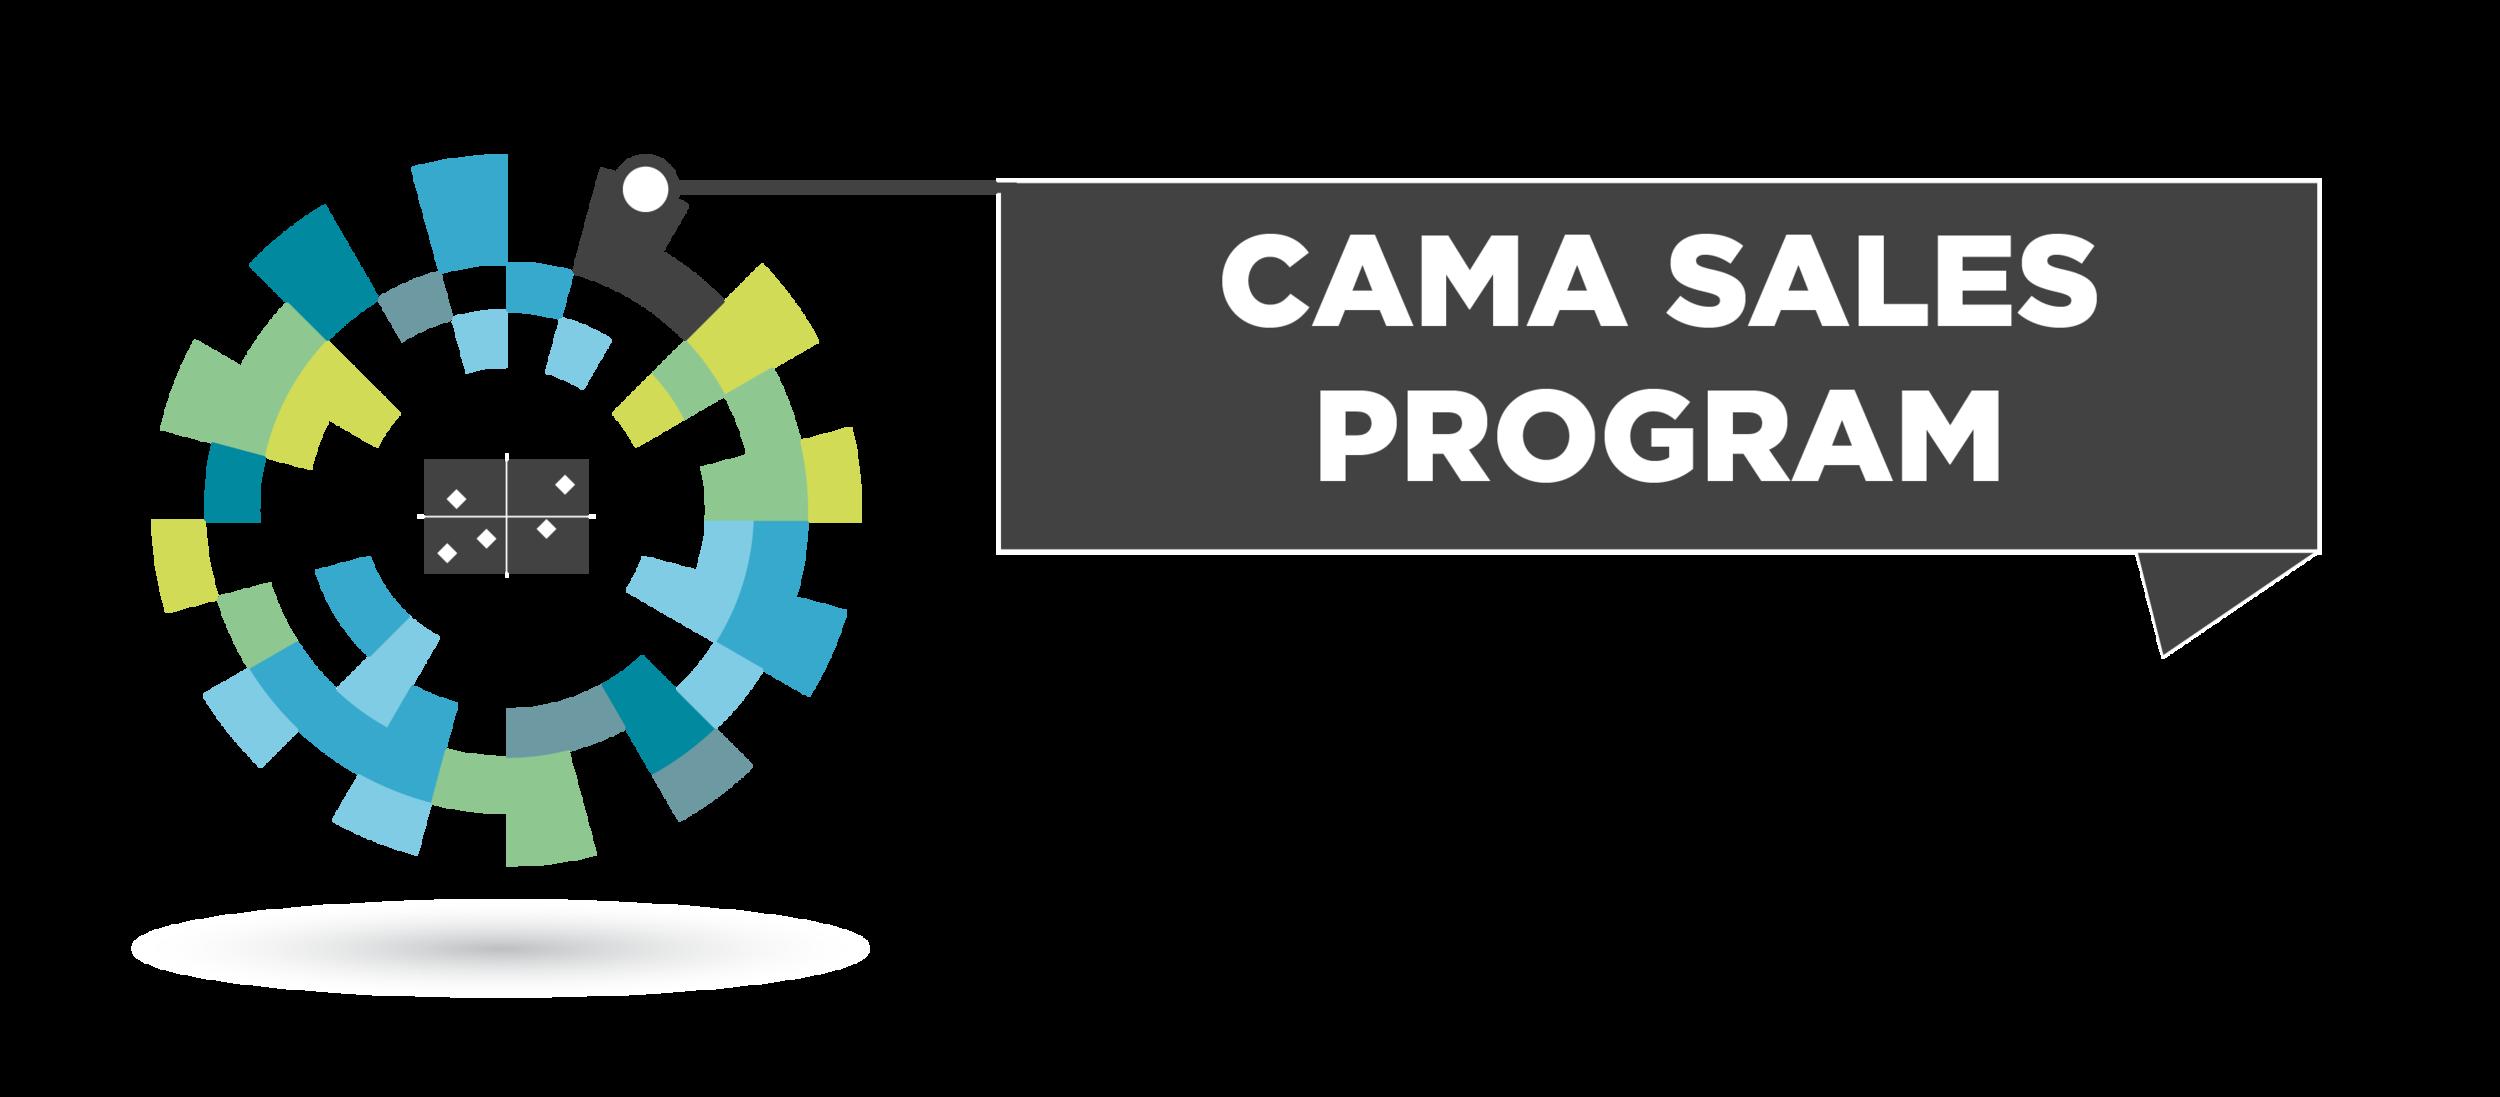 cama-sales-program-nem-australasia